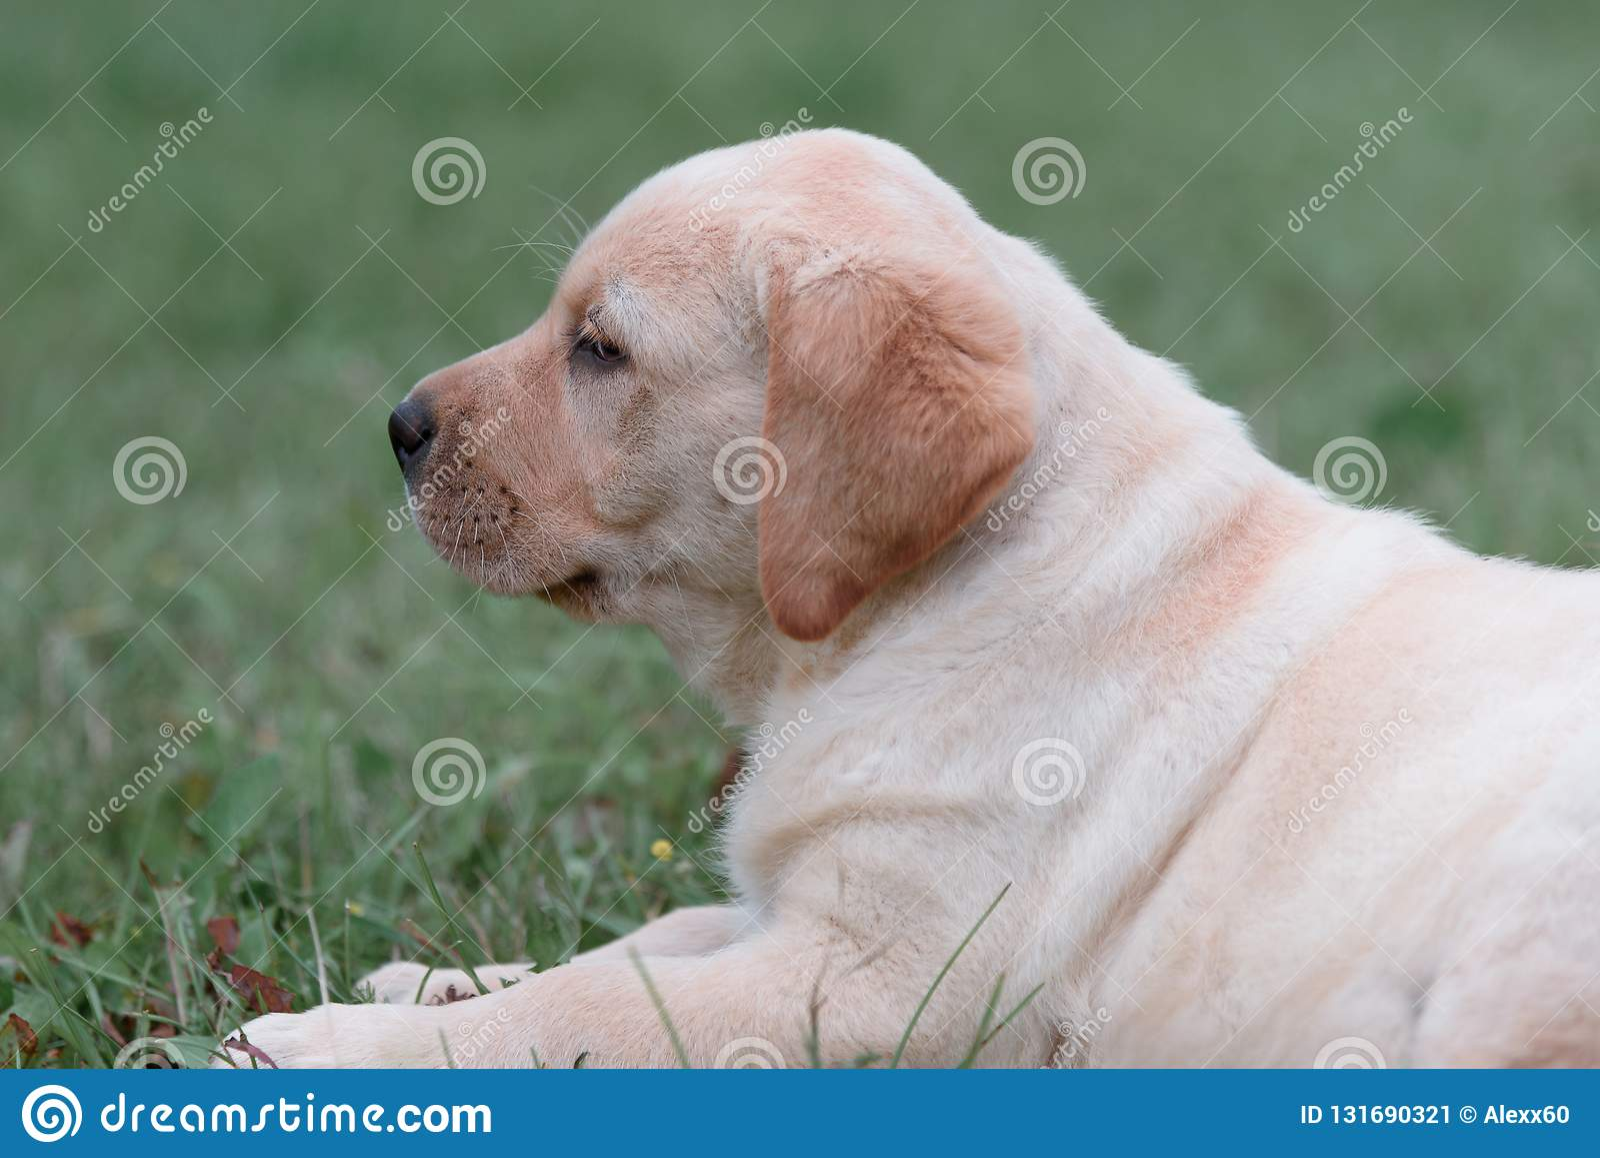 Chiot jaune mignon labrador retriever sur un fond d herbe verte